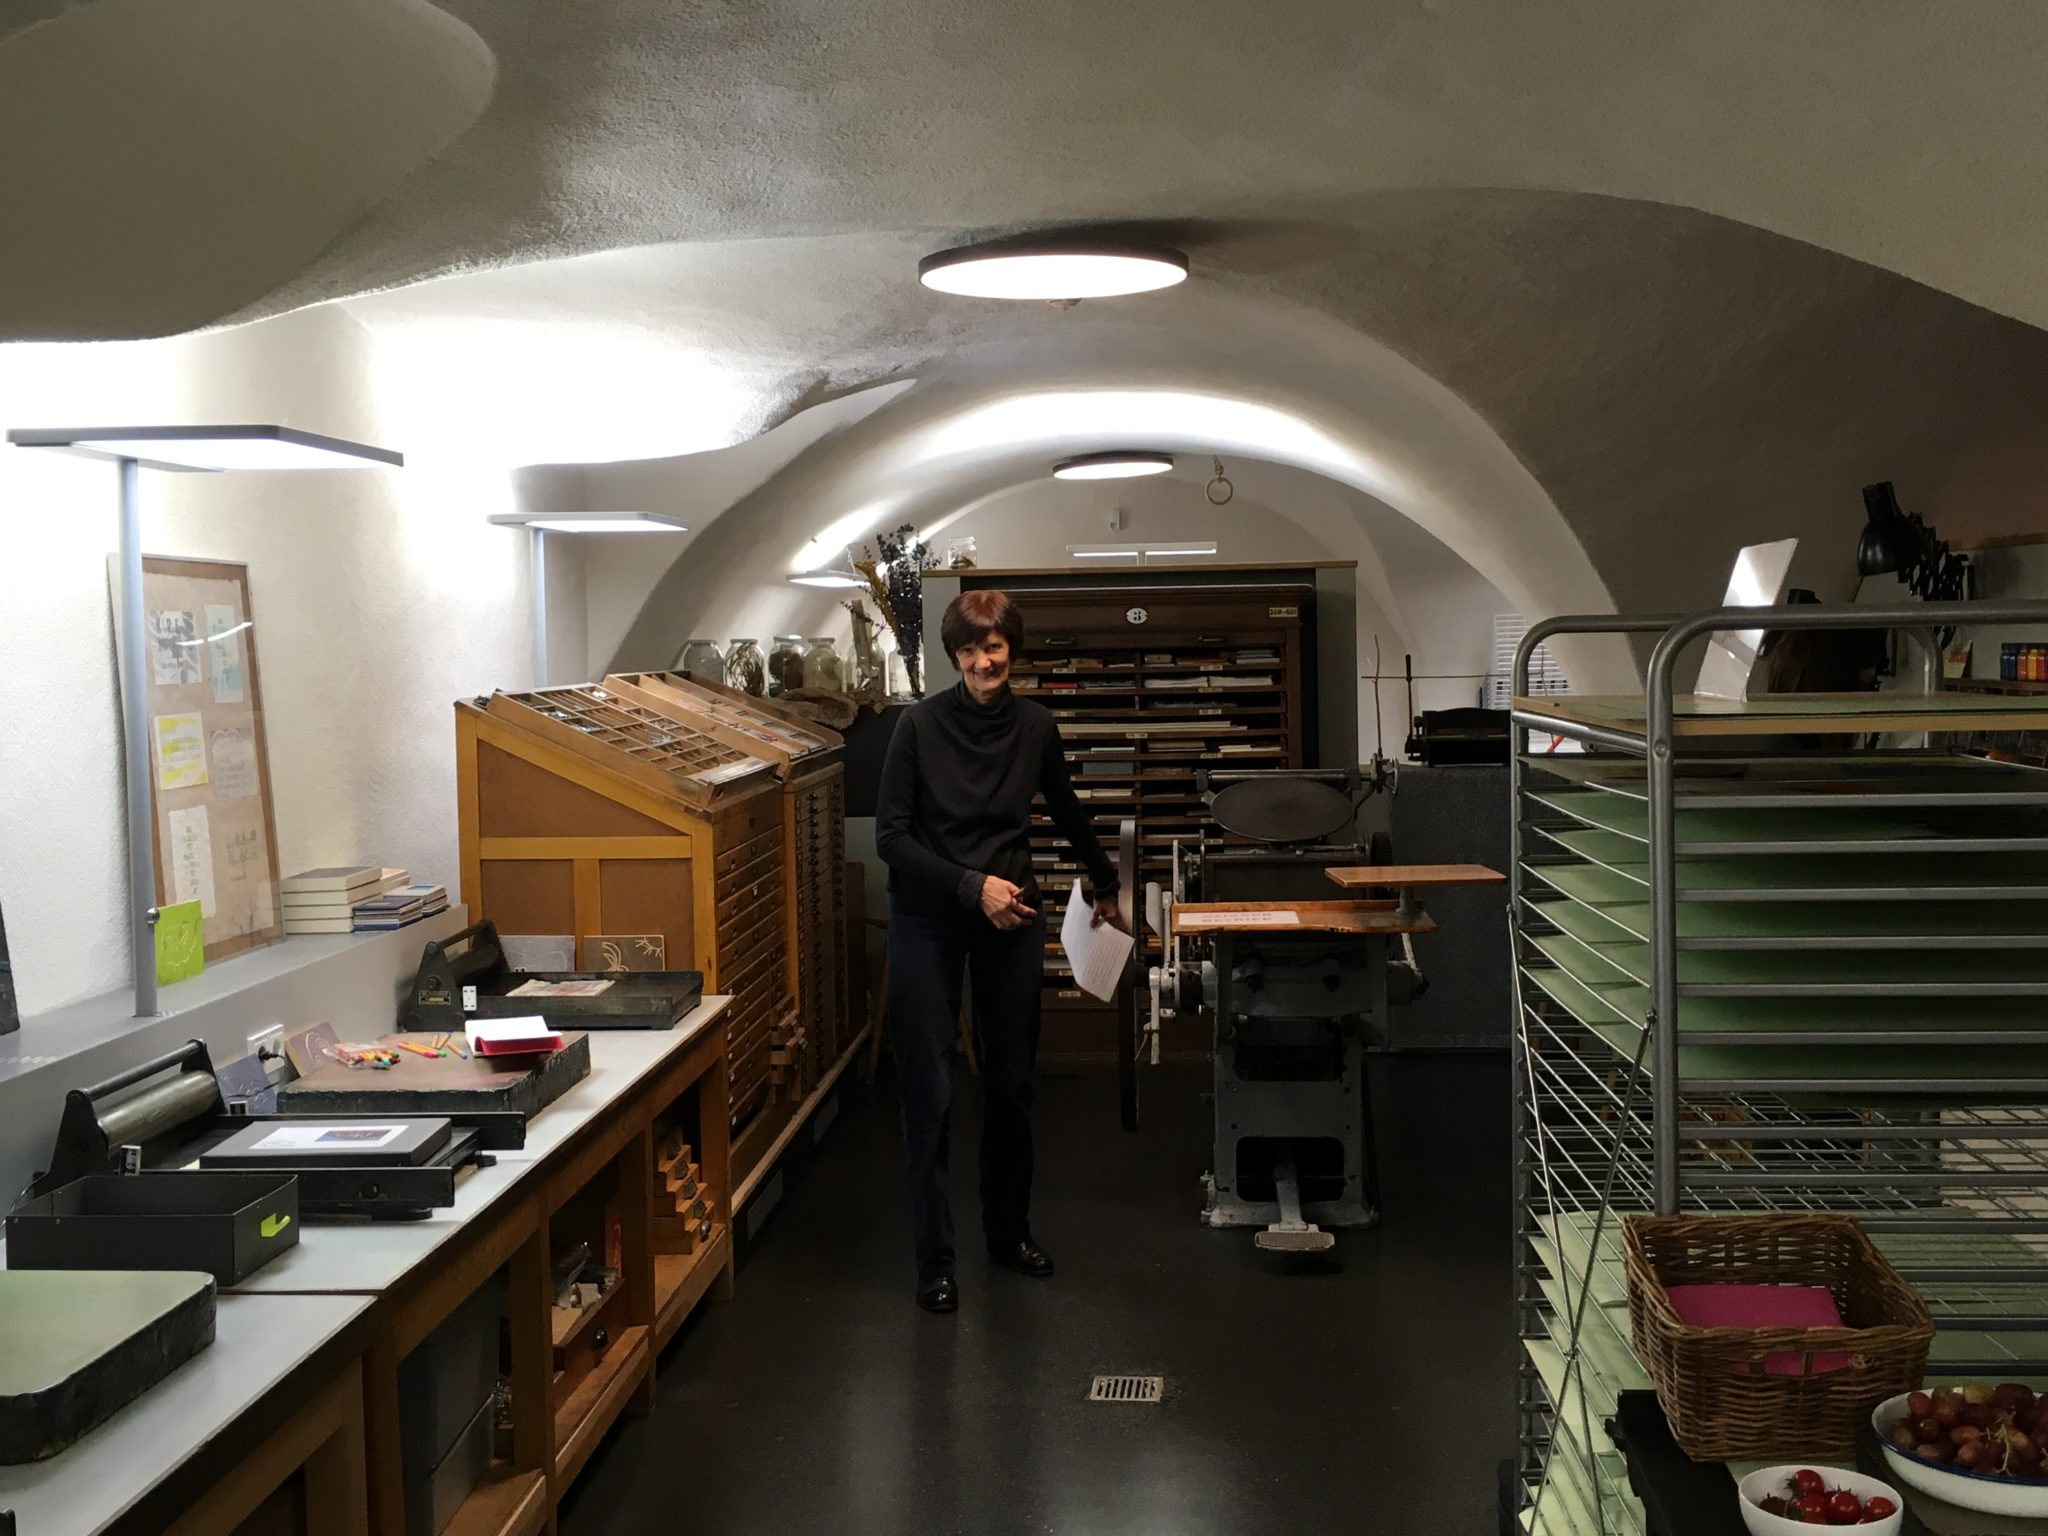 Blick in die Druckwerkstatt, in der Mitte die Kollegin